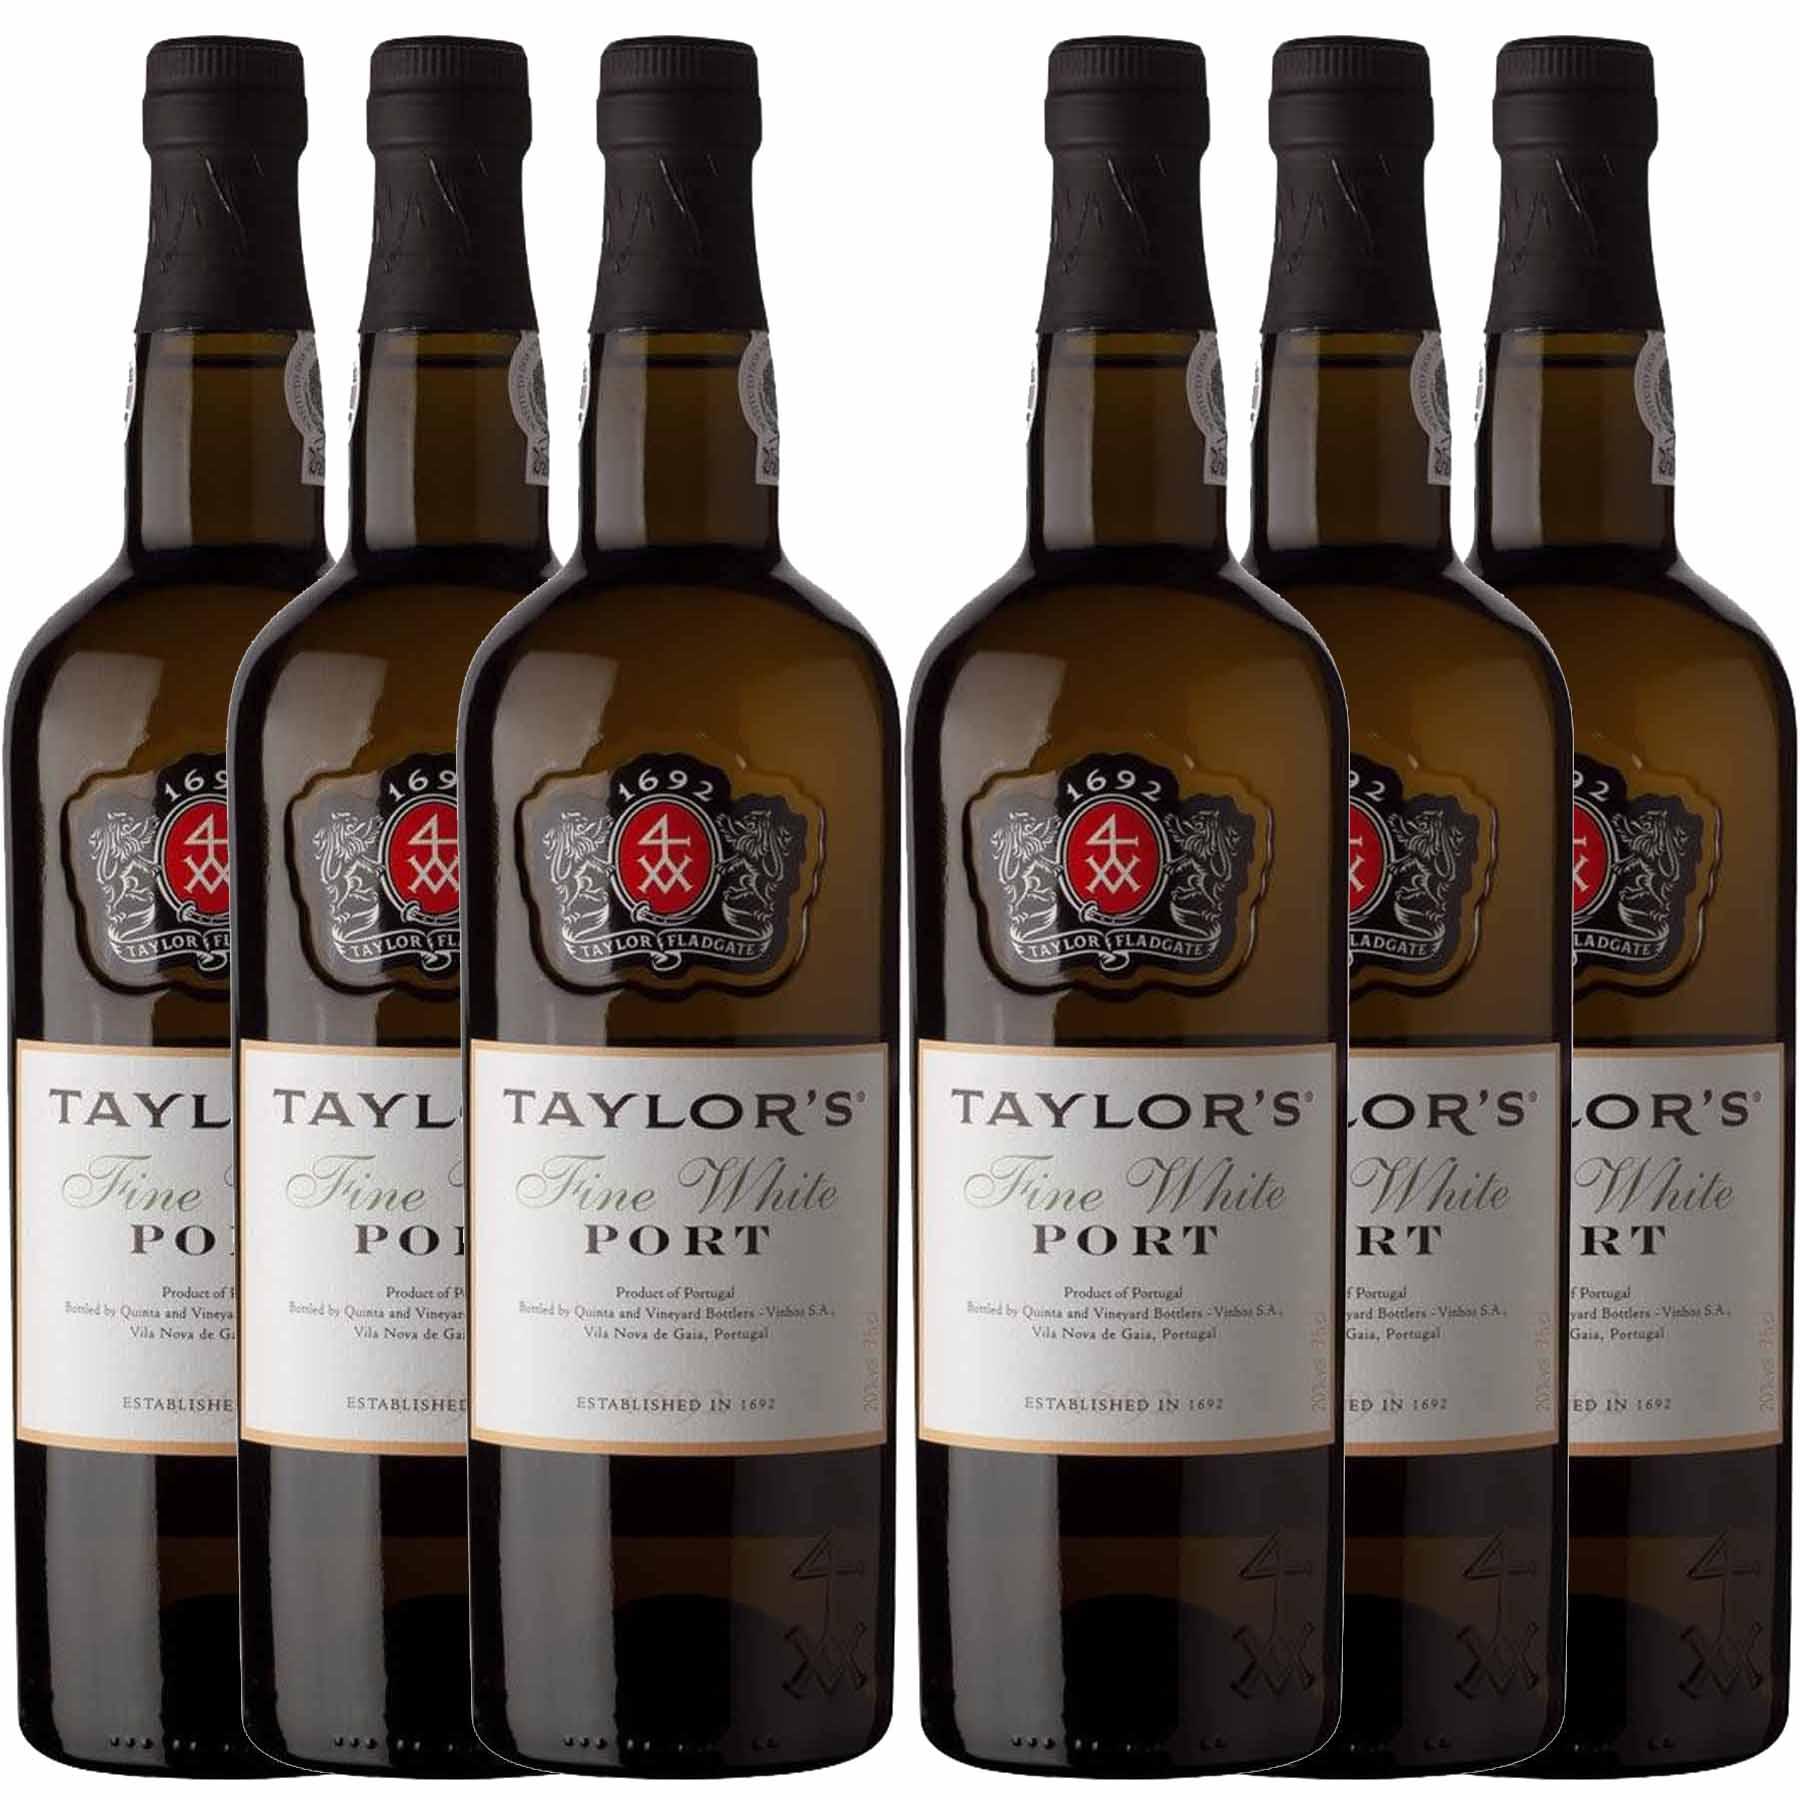 Kit 6x Vinho do Porto Branco Taylor's White Fine Douro 750ml